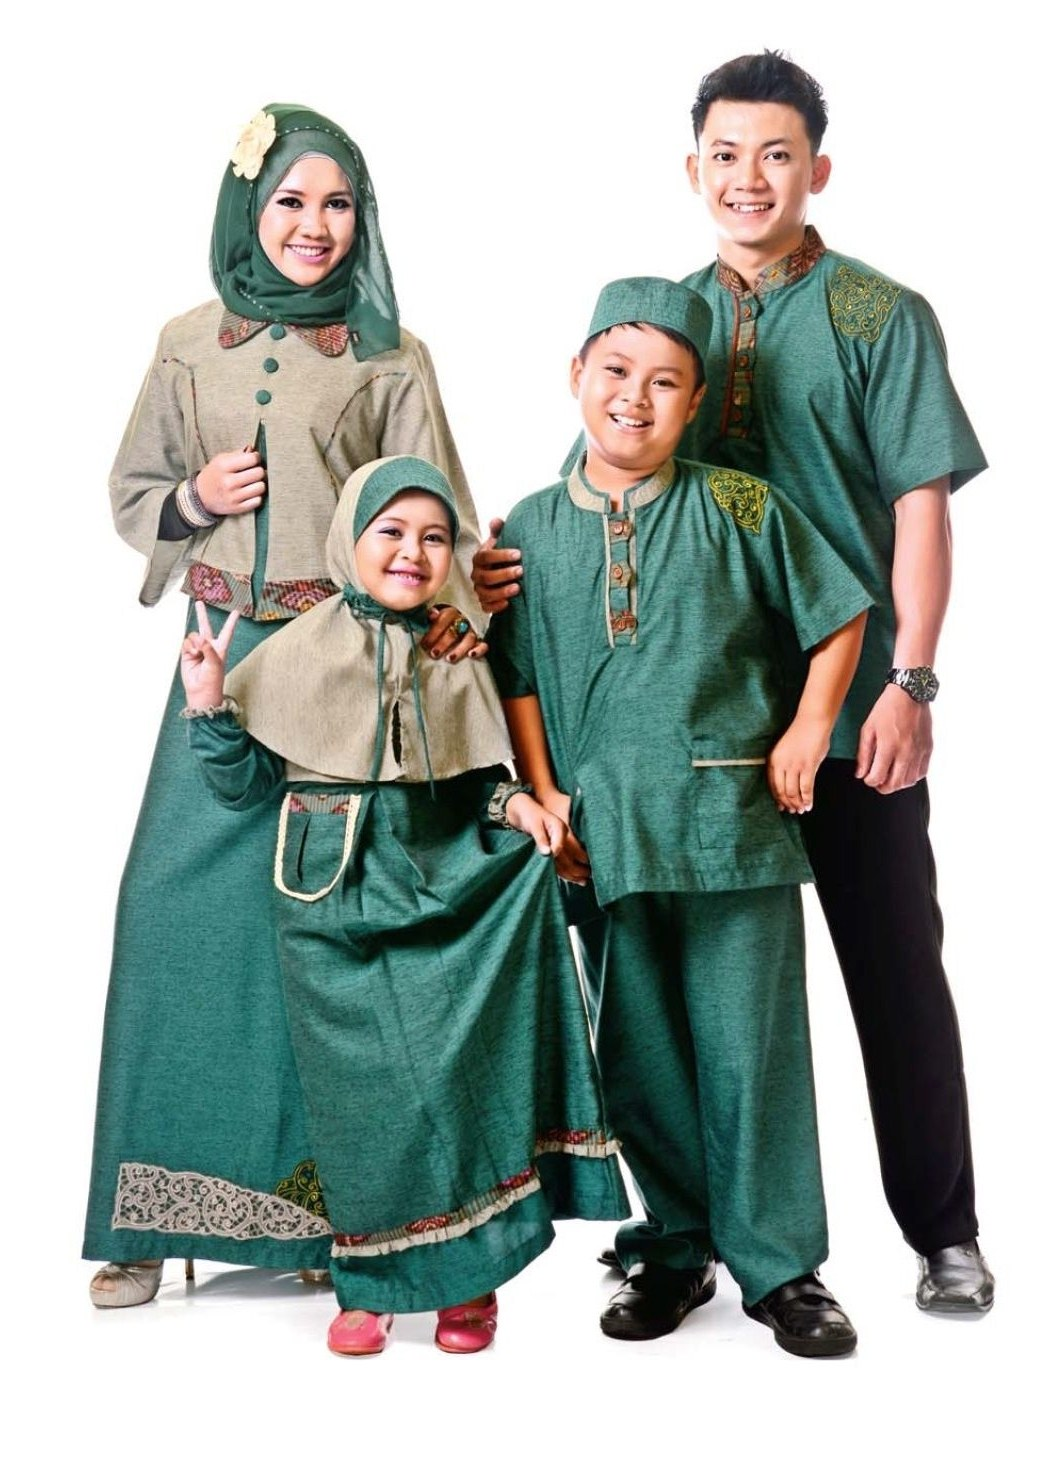 Inspirasi Model Baju Lebaran Untuk Keluarga 0gdr Baju Lebaran Keluarga 2016